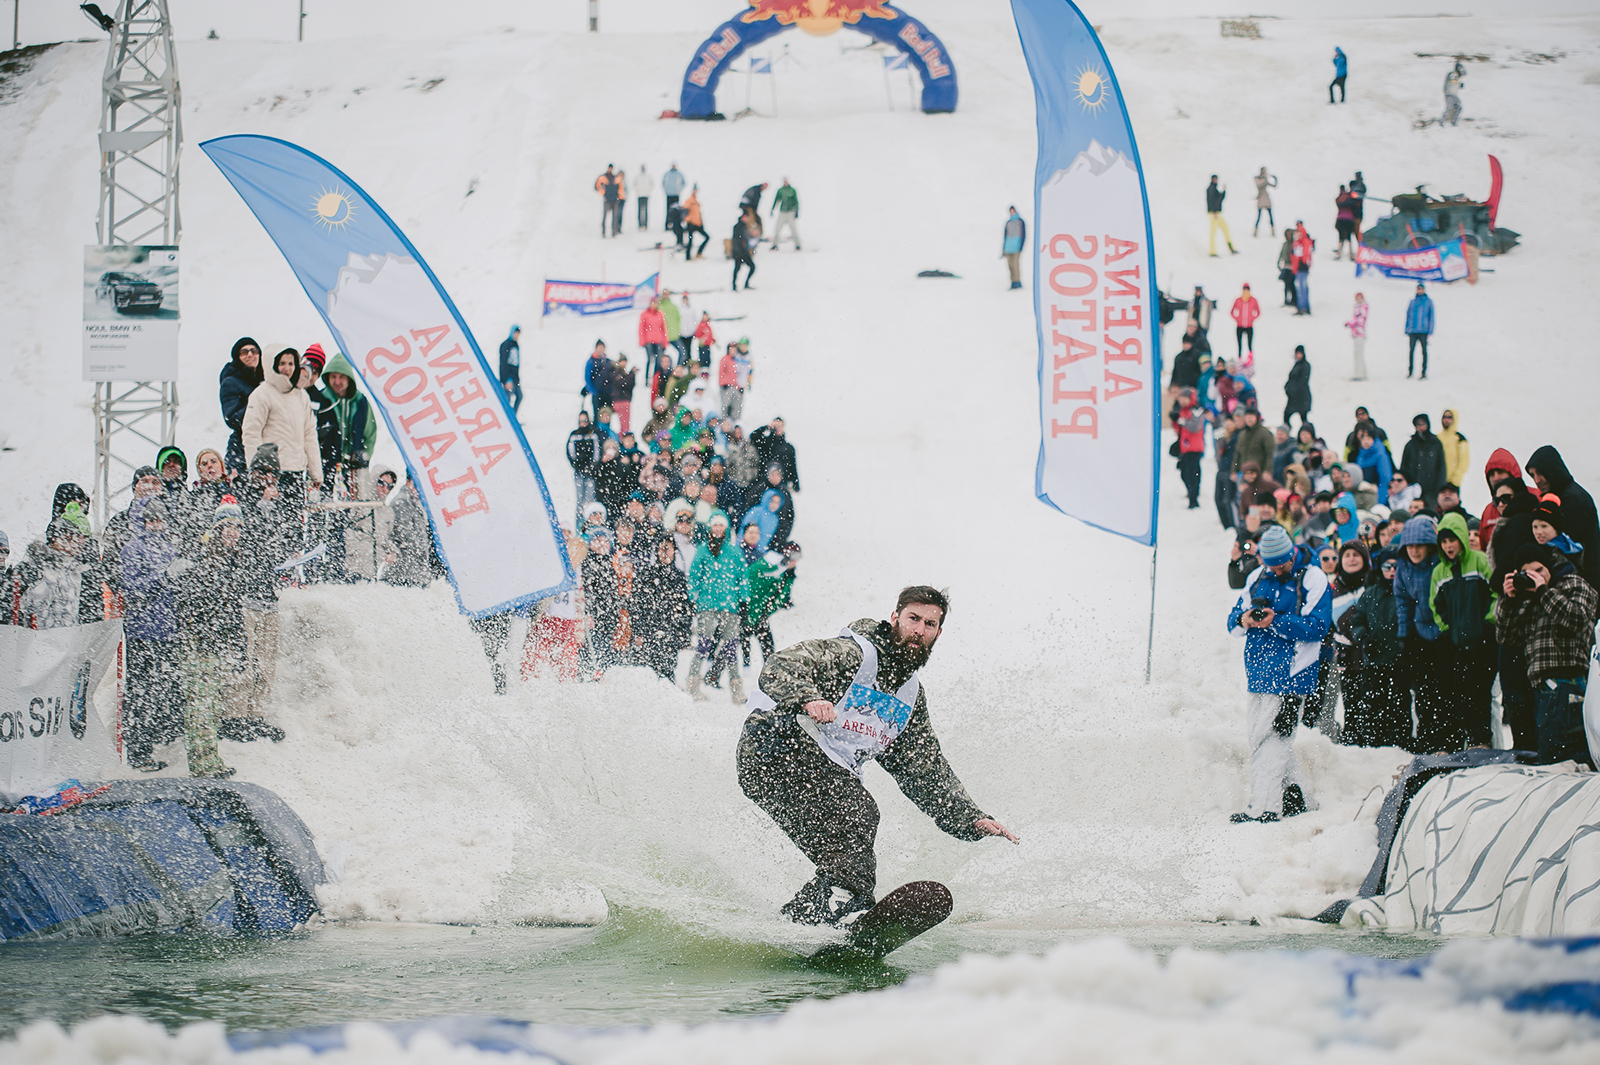 Slide and Freeze la Arena Platoș